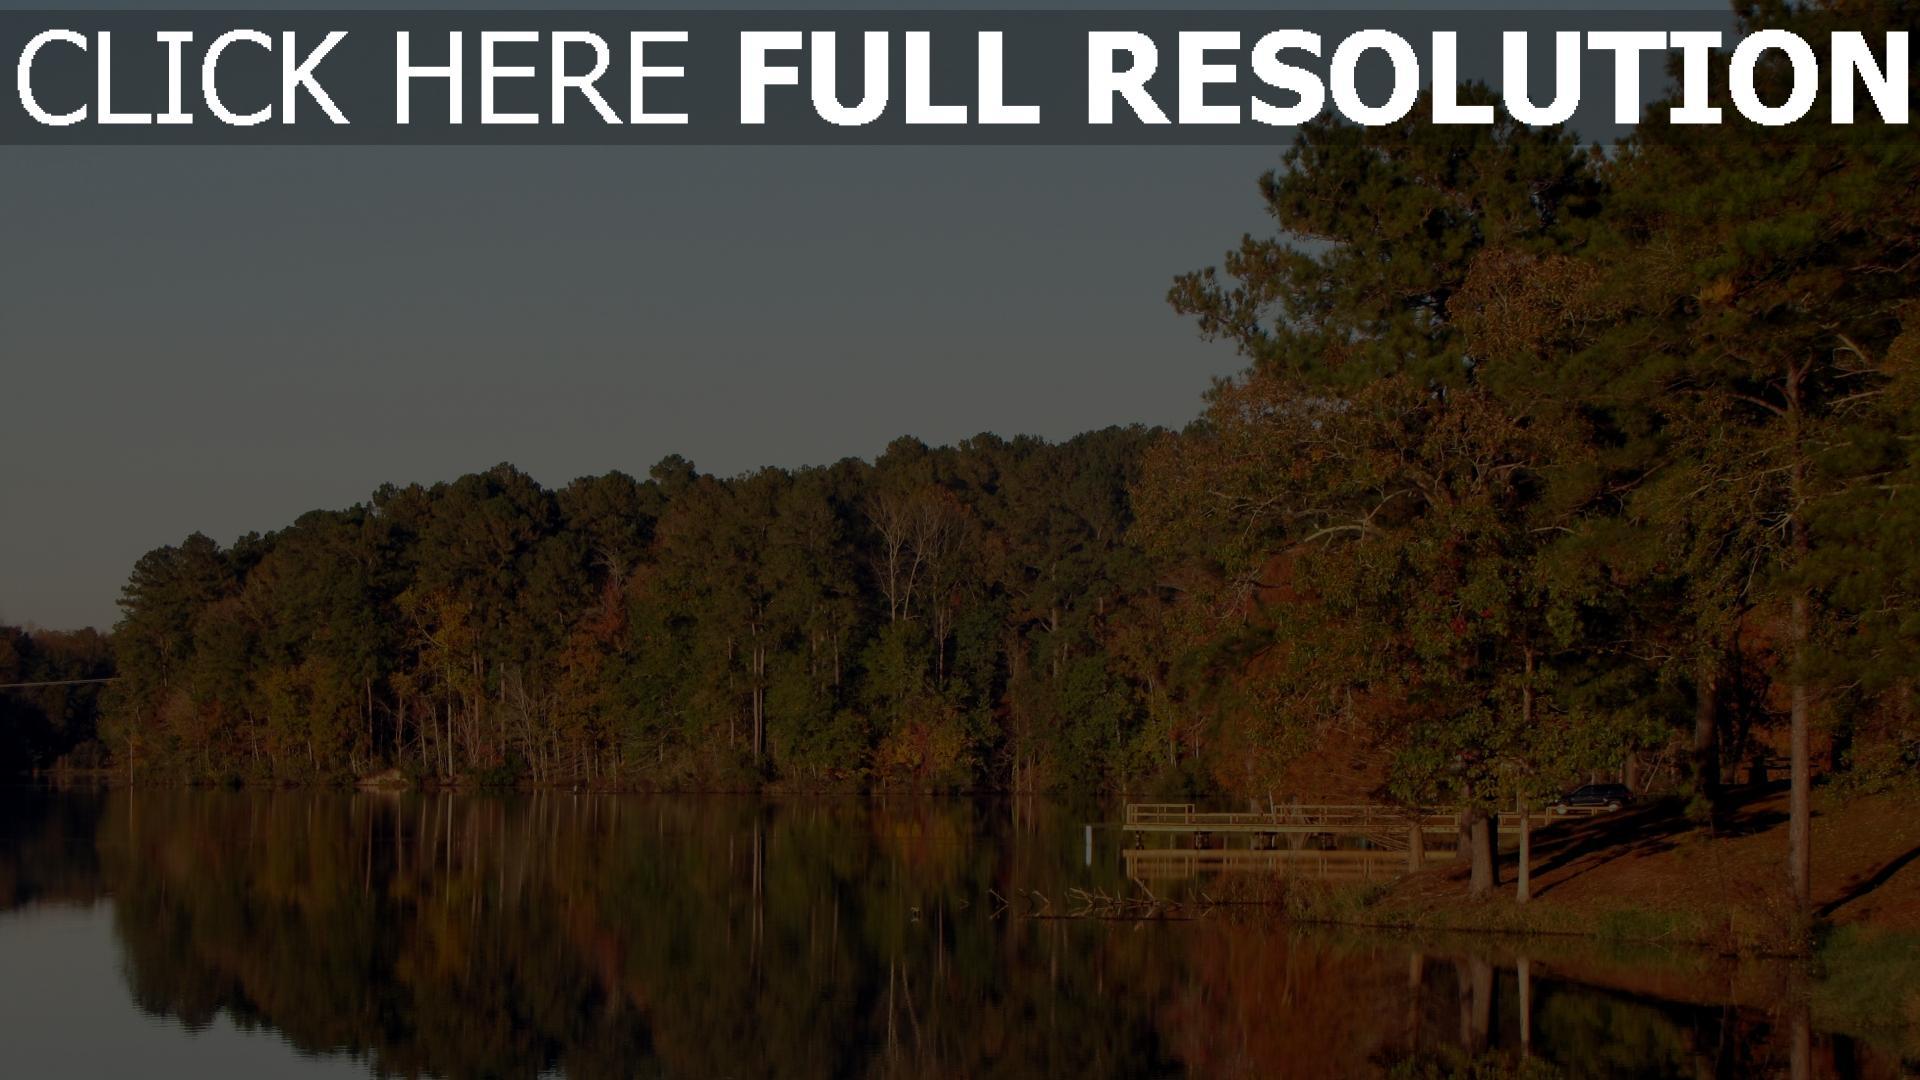 hd hintergrundbilder wald bäume herbst reflexion see 1920x1080